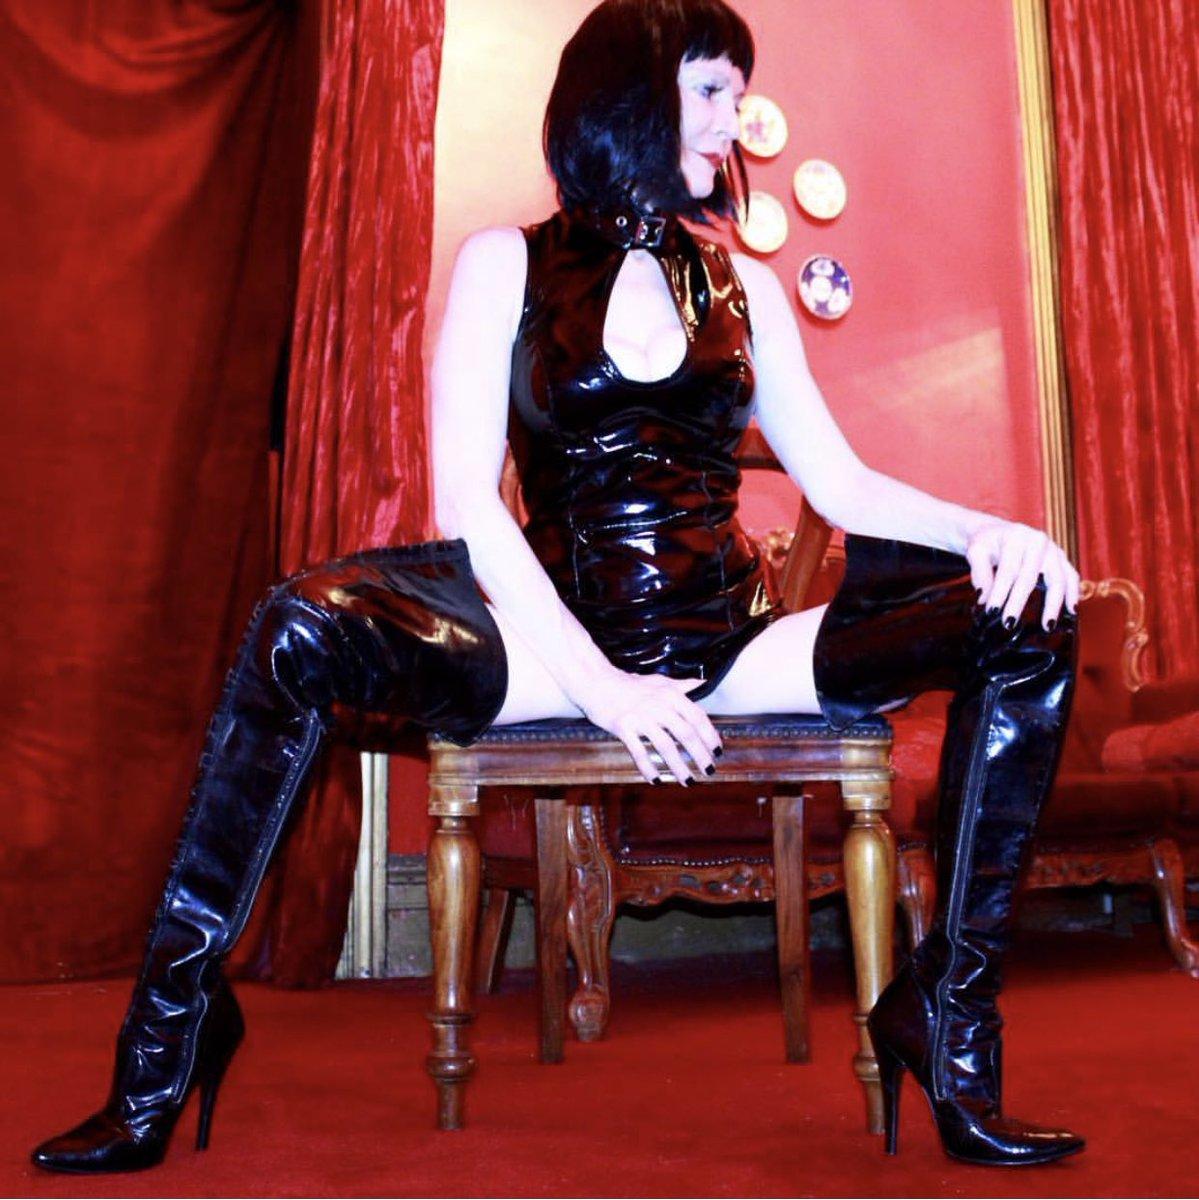 #mistressskylar #thekastle #bdsm #sydneymistress #dominatrix #bootfetish  #monday #pvc #thighhigh #disciplinepic.twitter.com/5ZFfB2NcgZ